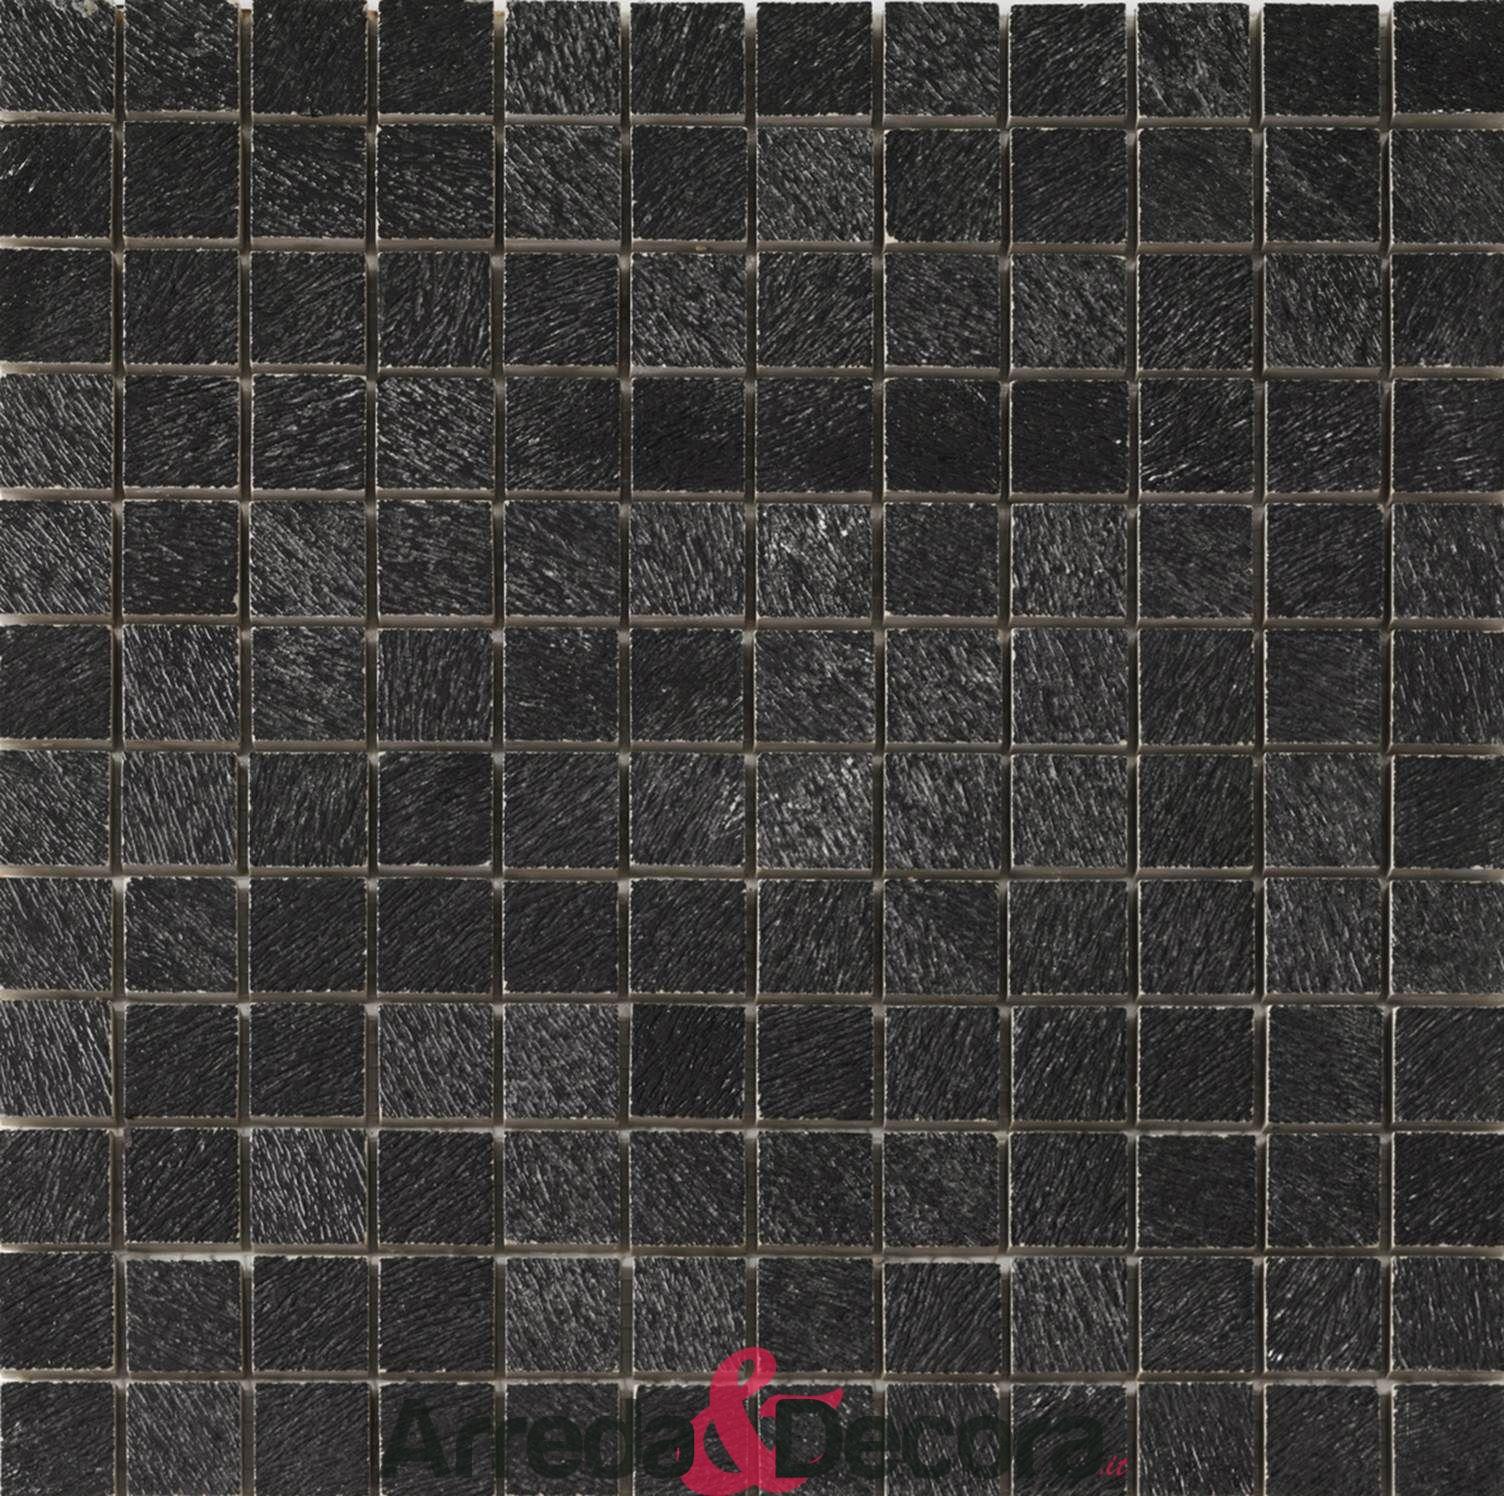 mosaico nero ruvido